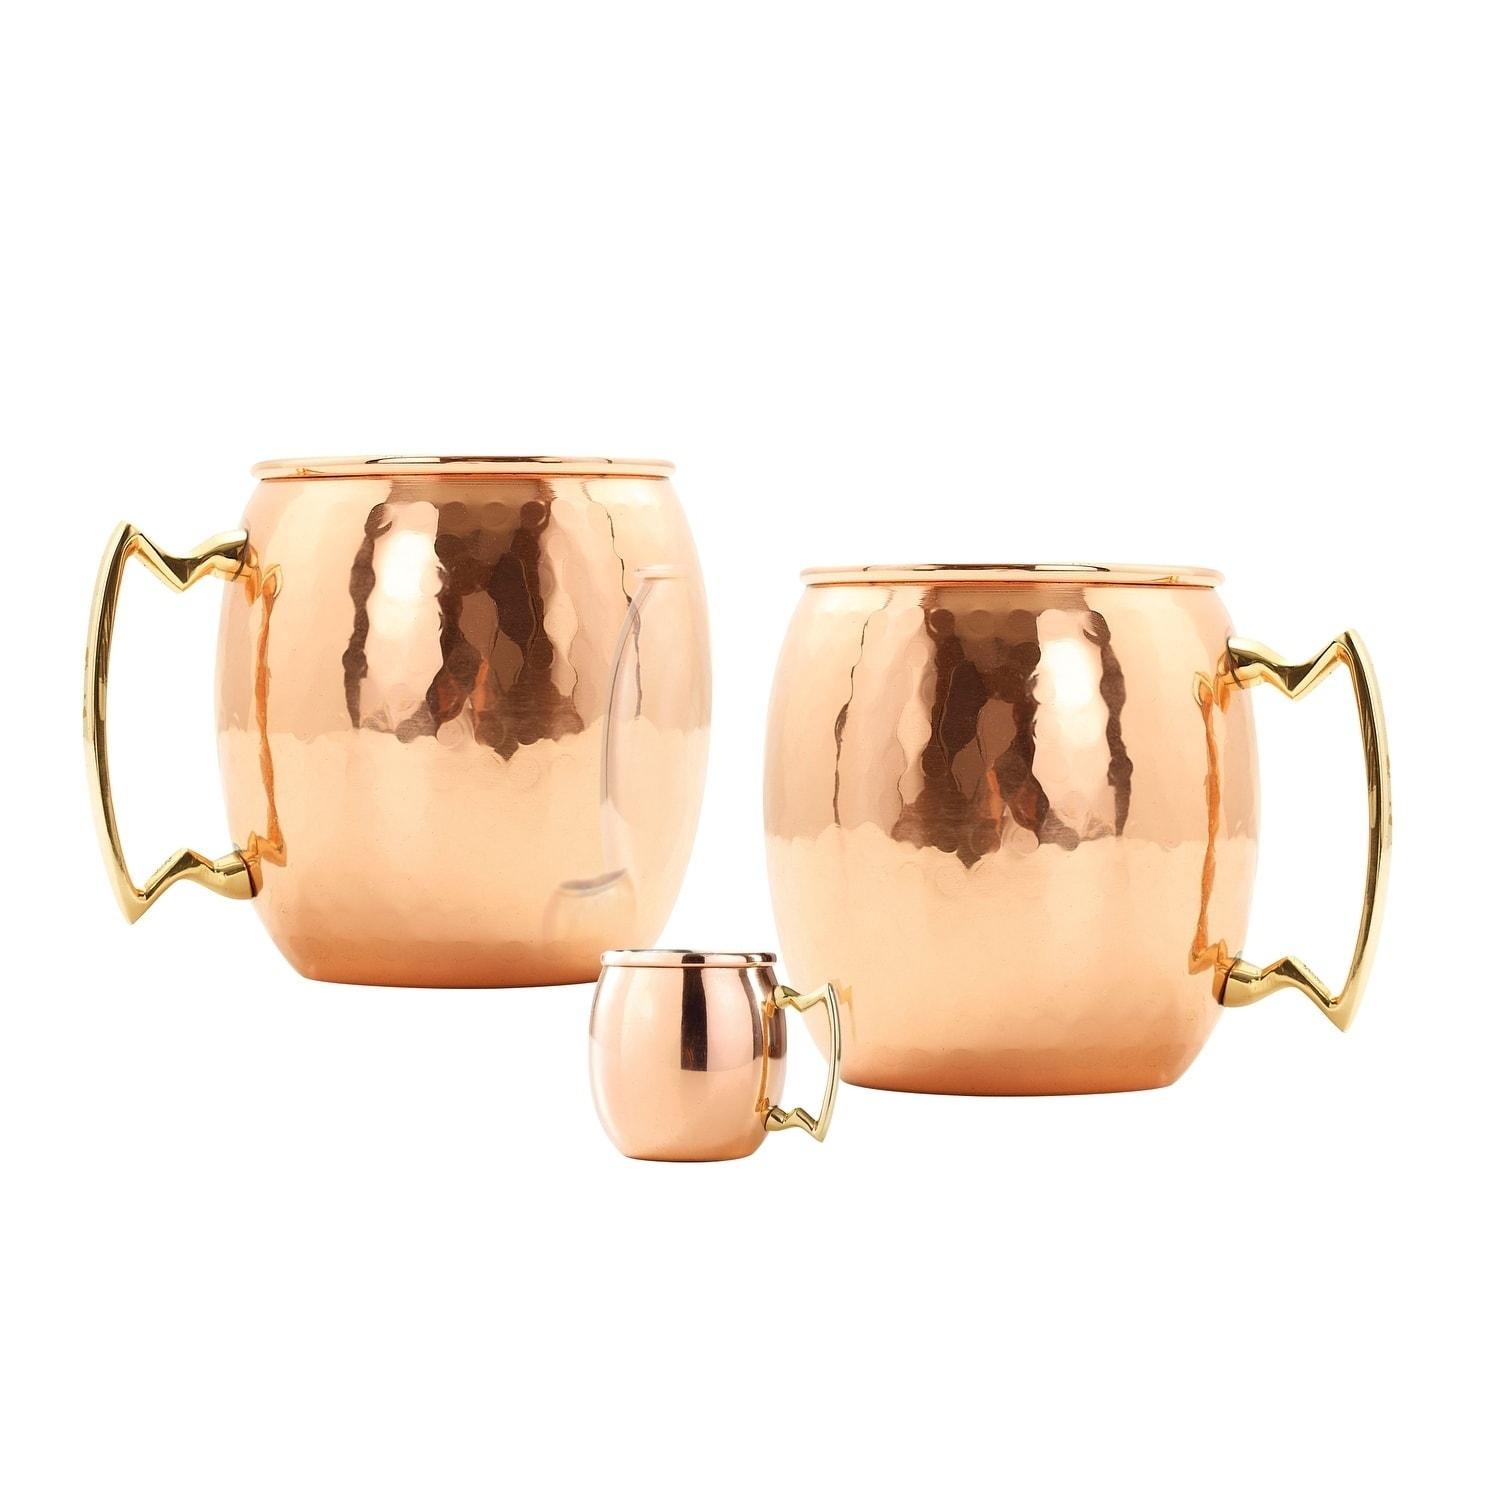 Set Of 2 24 Oz Hammered Solid Copper Moscow Mule Mug L Nl Cbh With Bonus Mini Mug Overstock 18045533